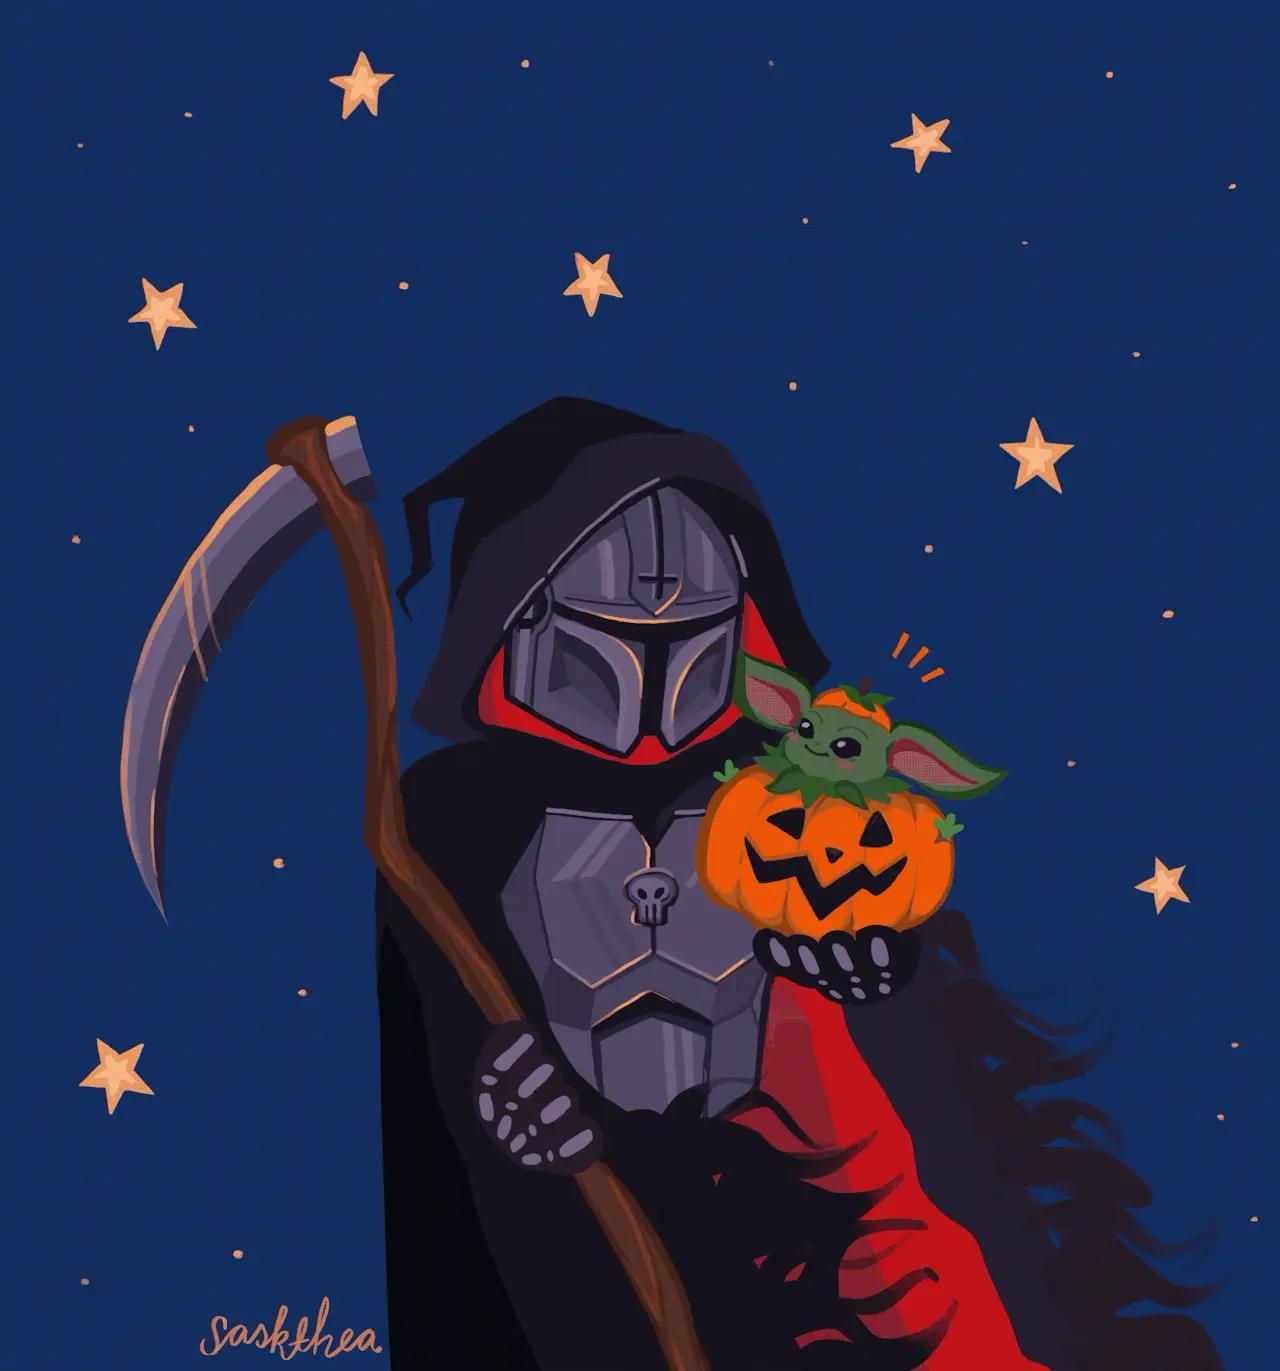 Pin By Brittany Subias On Mando Fando Star Wars Drawings Star Wars Artwork Star Wars Memes